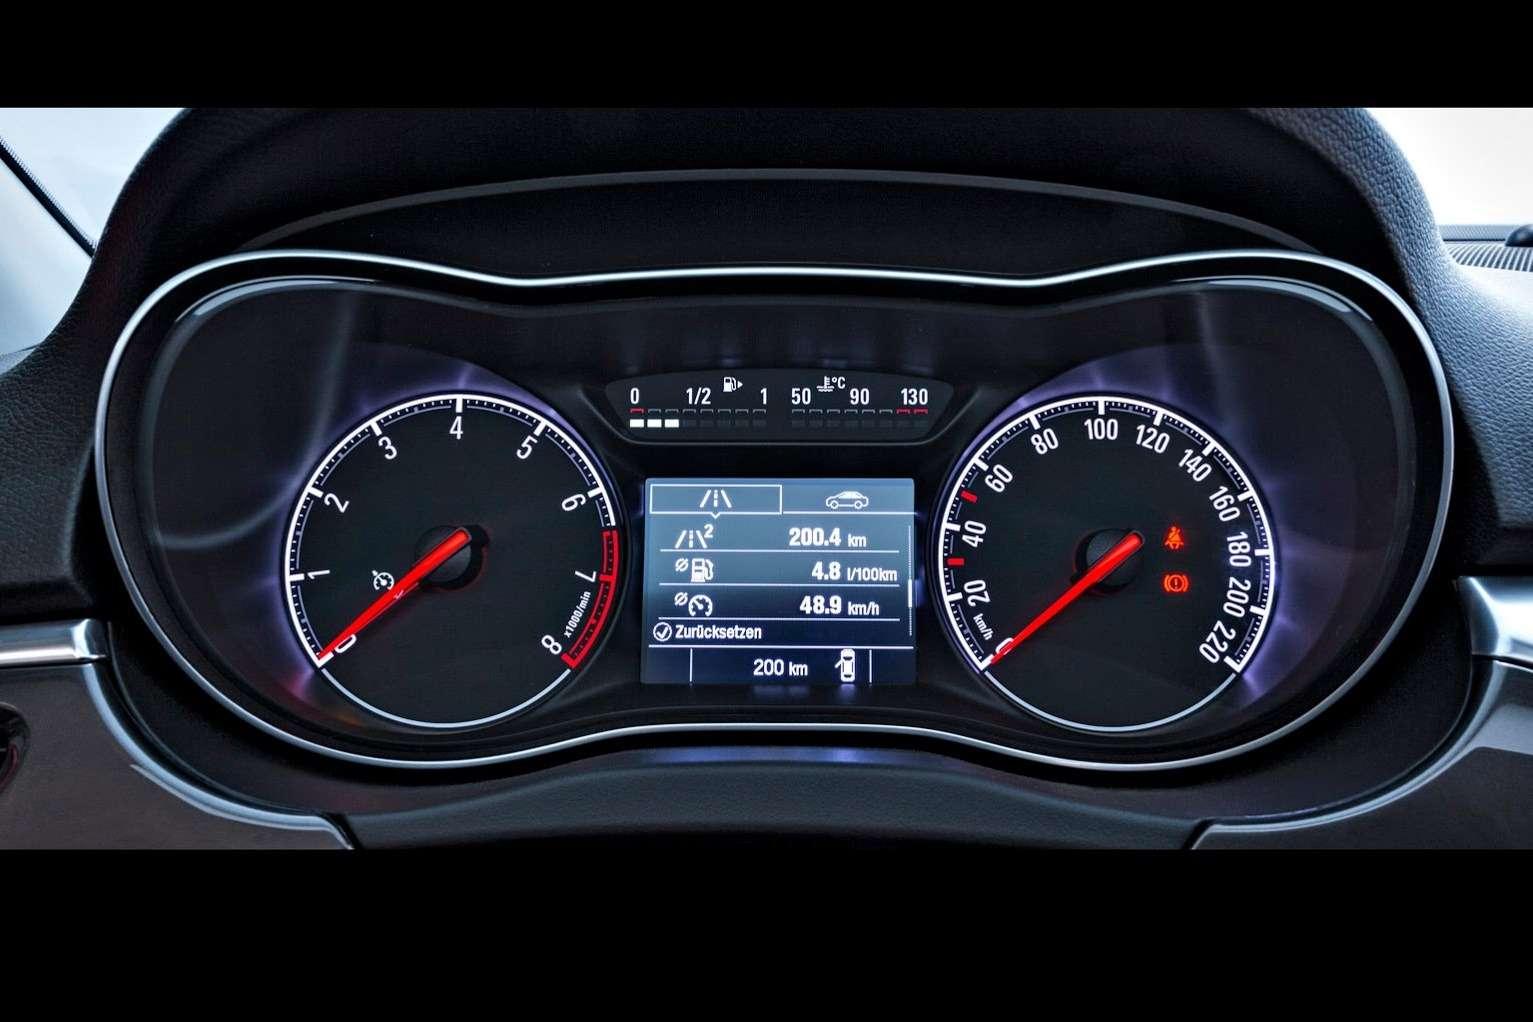 2015-Opel-Corsa-11